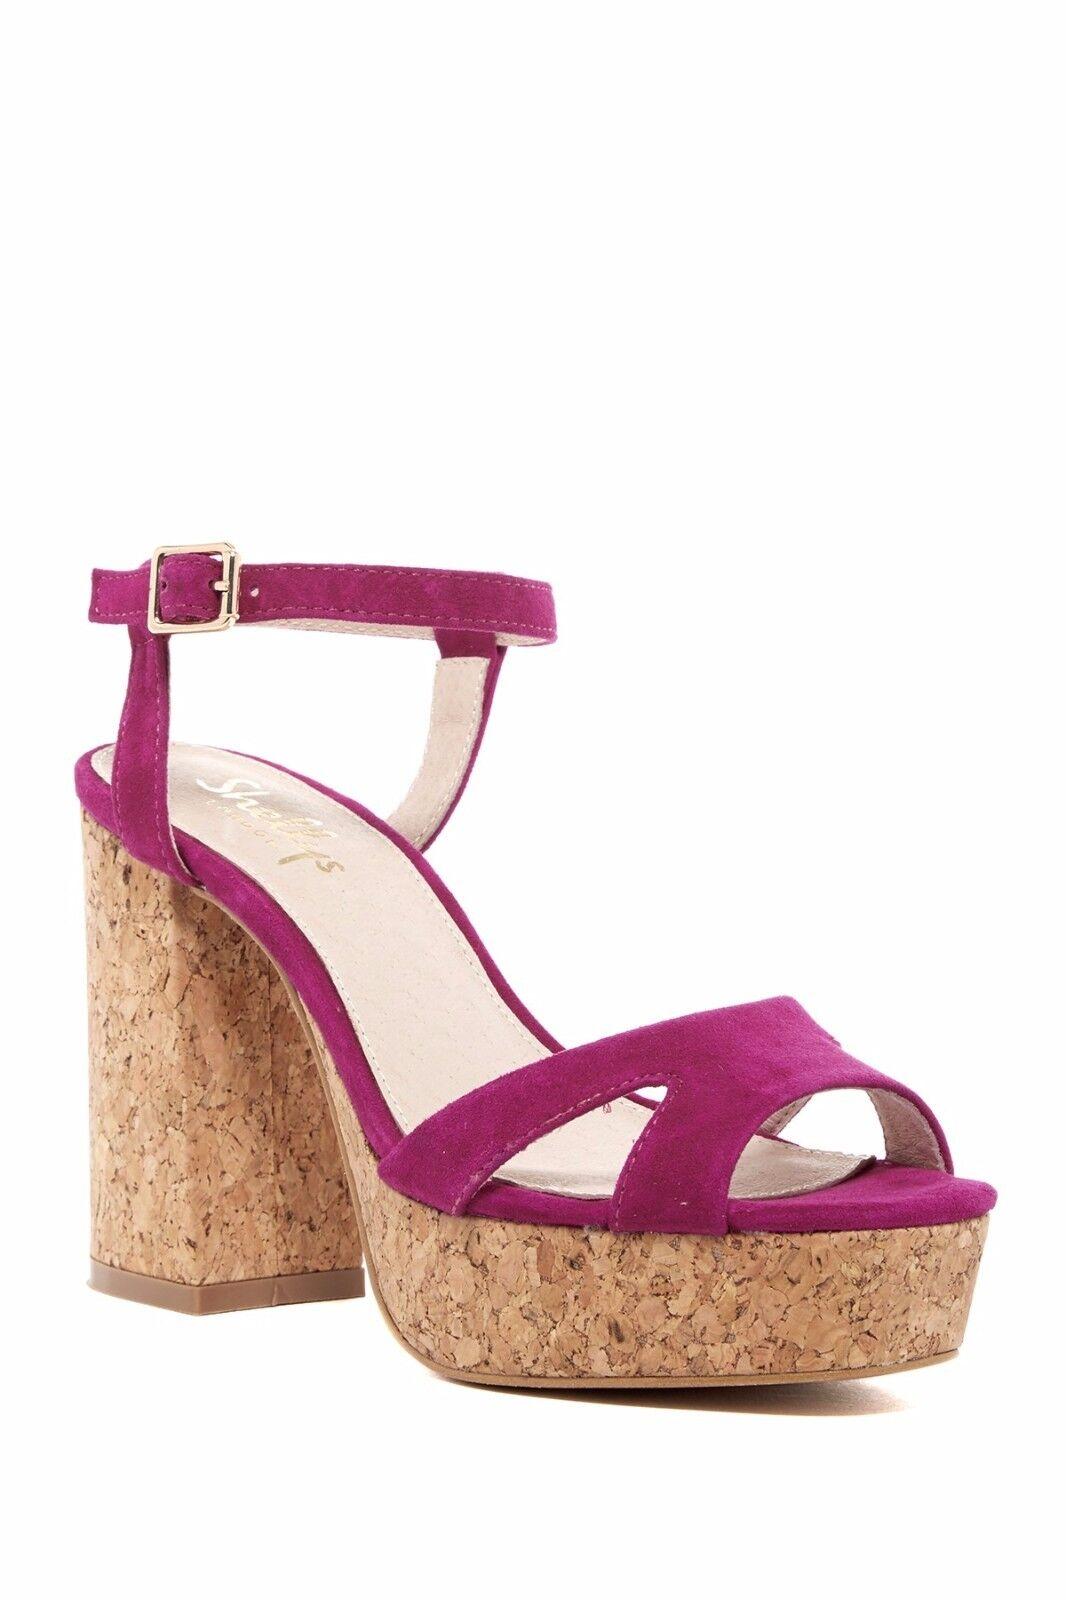 New Shellys London Dee Platform Heeled Sandals  women's size US 7.5 EUR 38